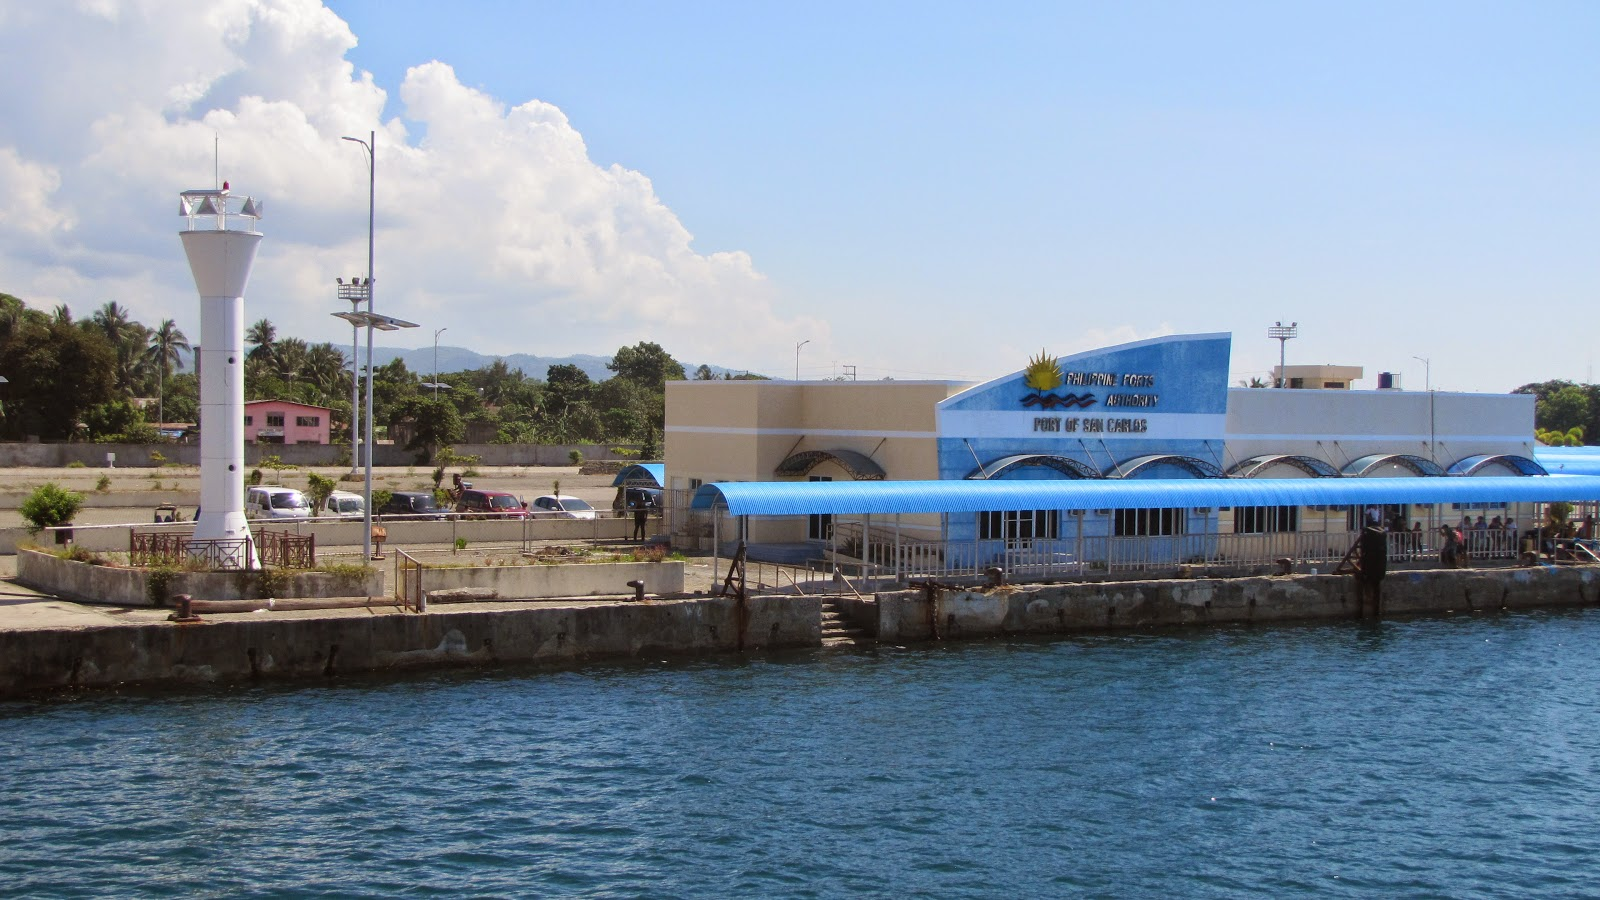 FTW! Travels, bacolod trip, local trip, Port of San Carlos, Negros